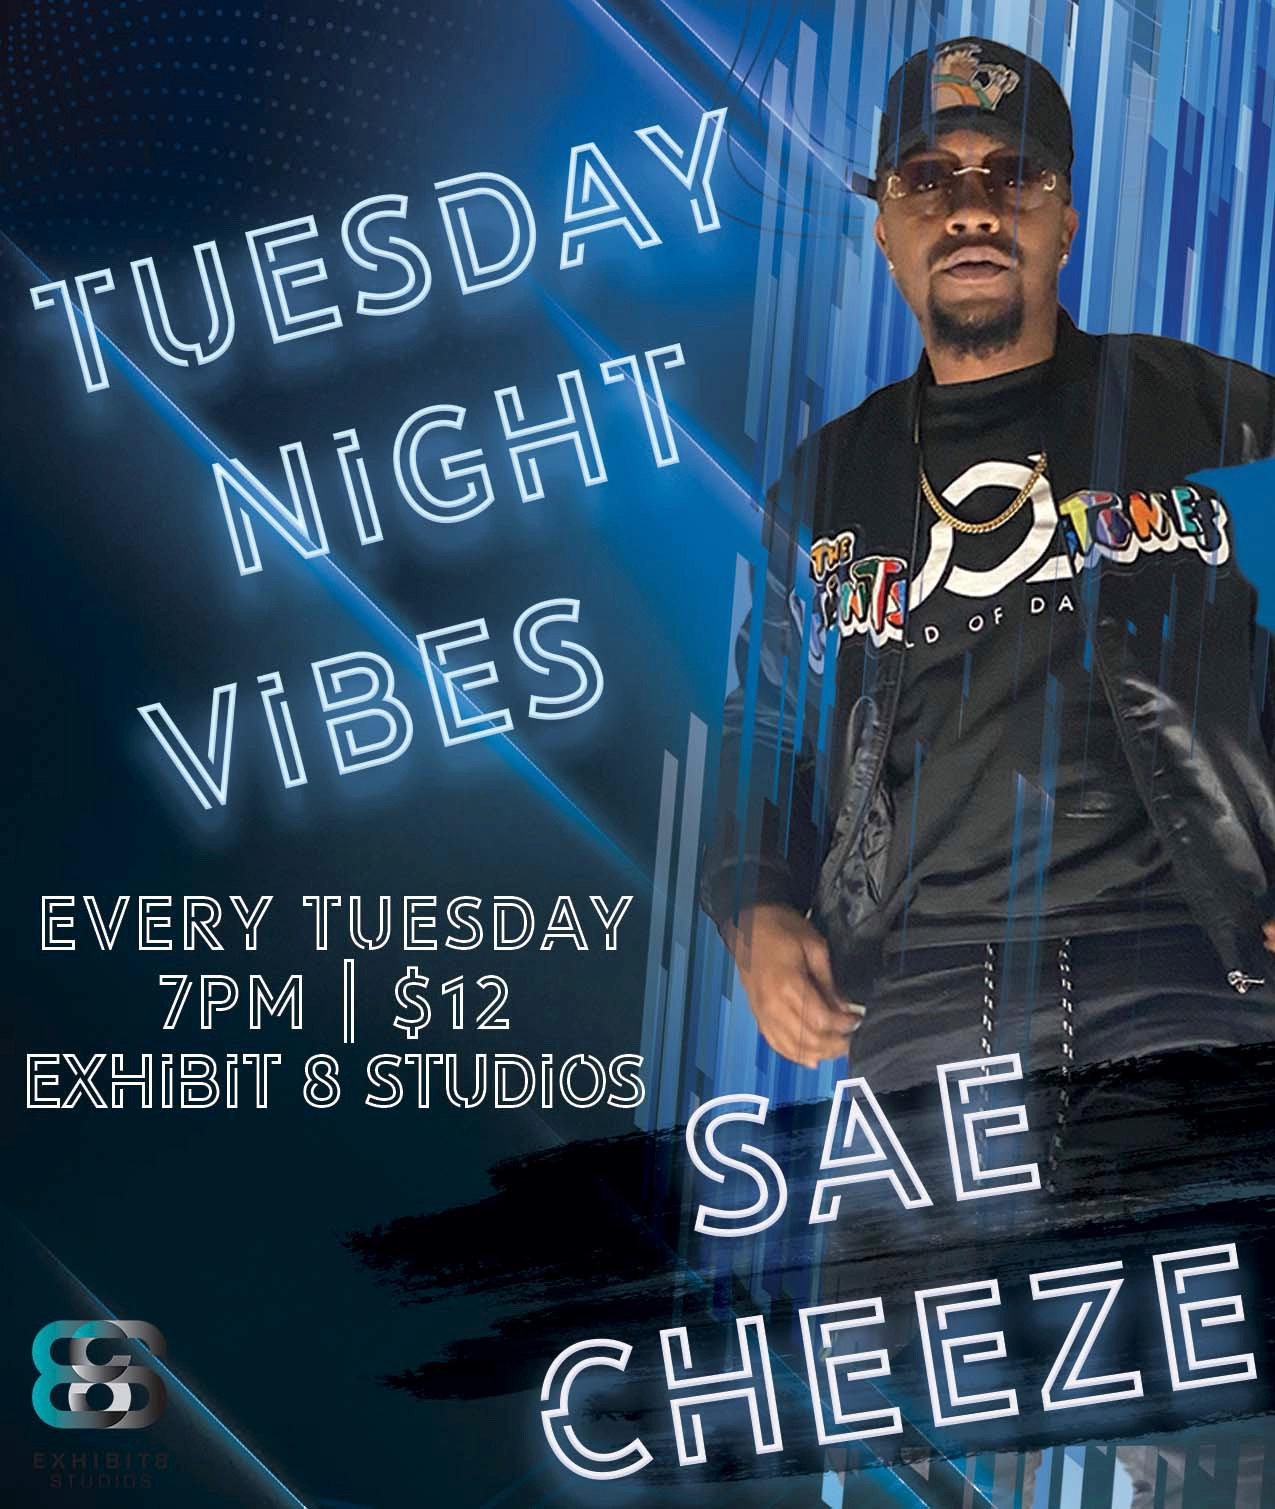 #TuesdayNightVibes W/Sae Cheeze